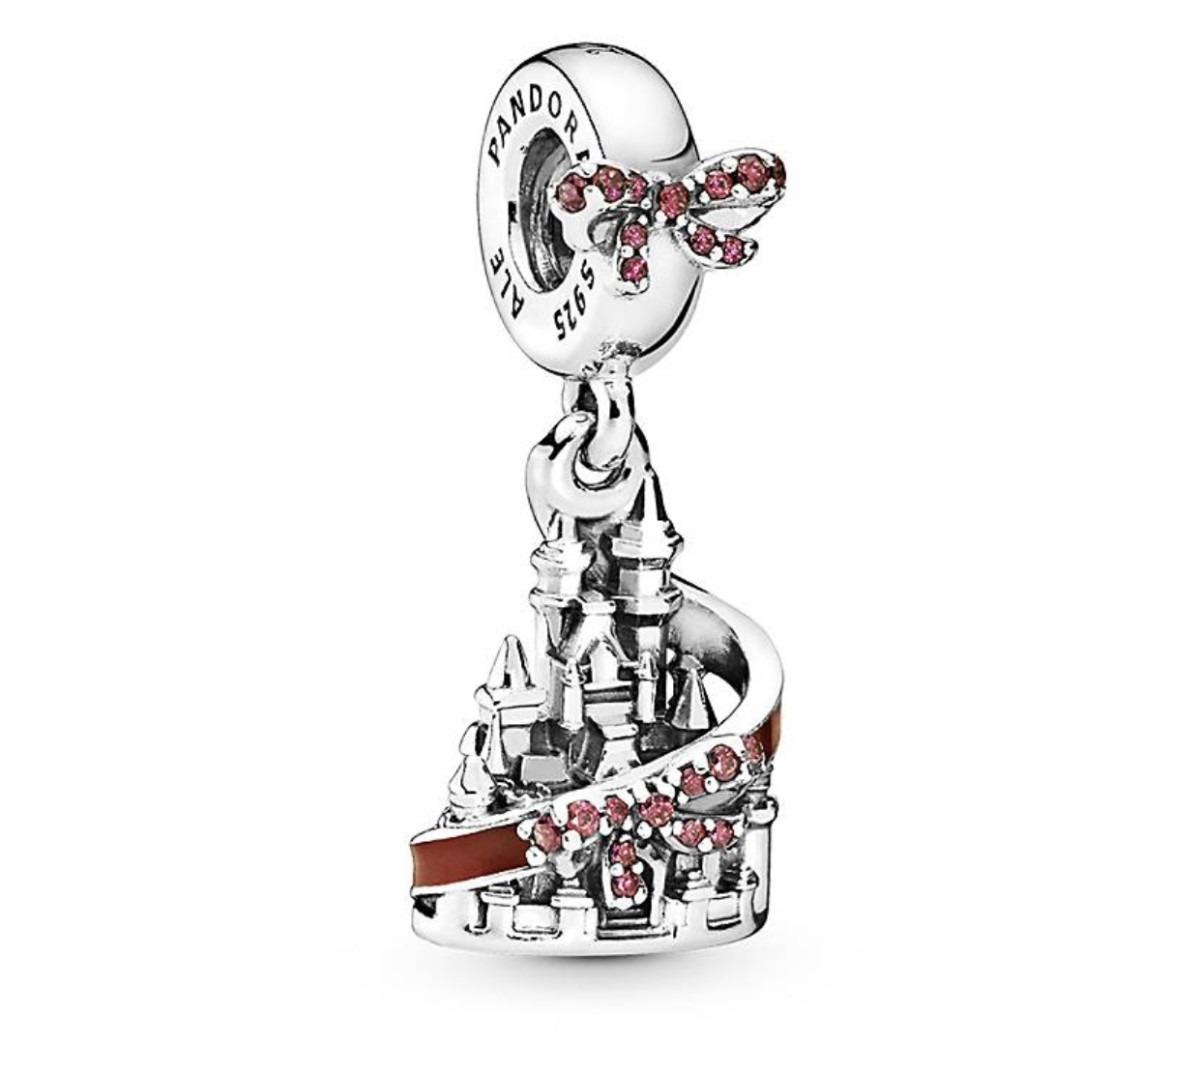 Disney Pandora Charms for the Holidays! 4